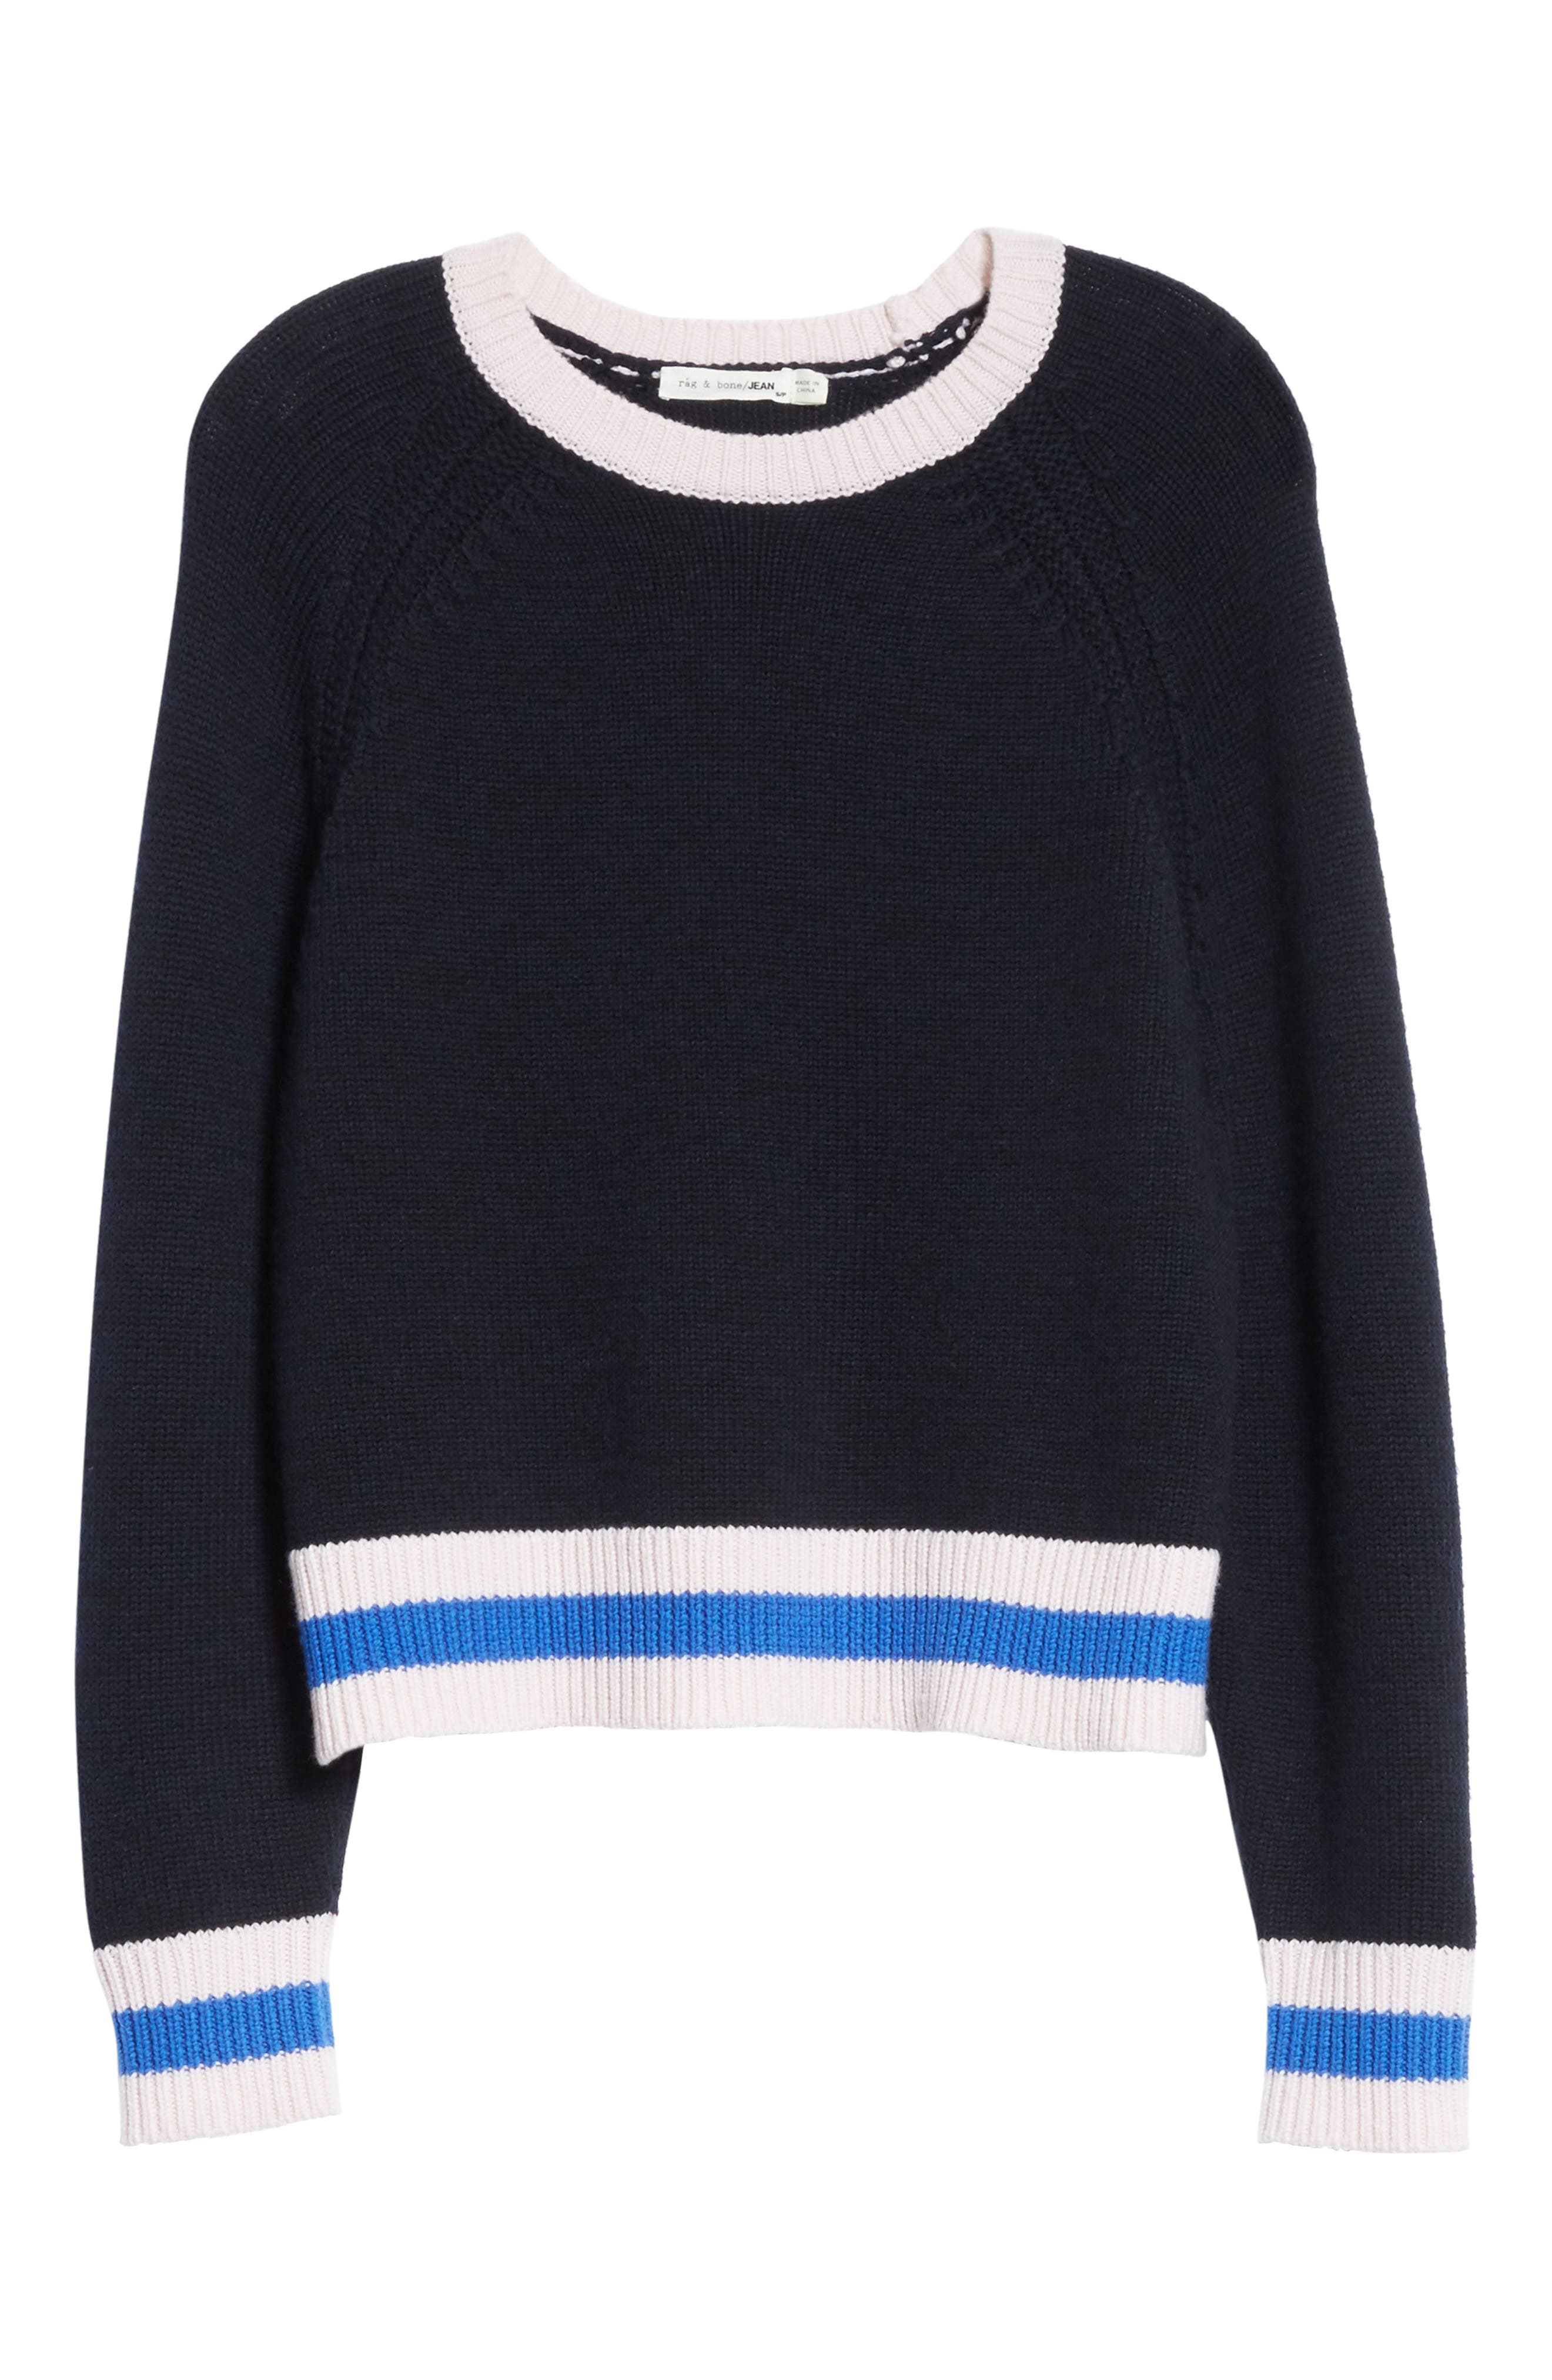 Hattie Crewneck Merino Wool Sweater,                             Alternate thumbnail 6, color,                             Navy